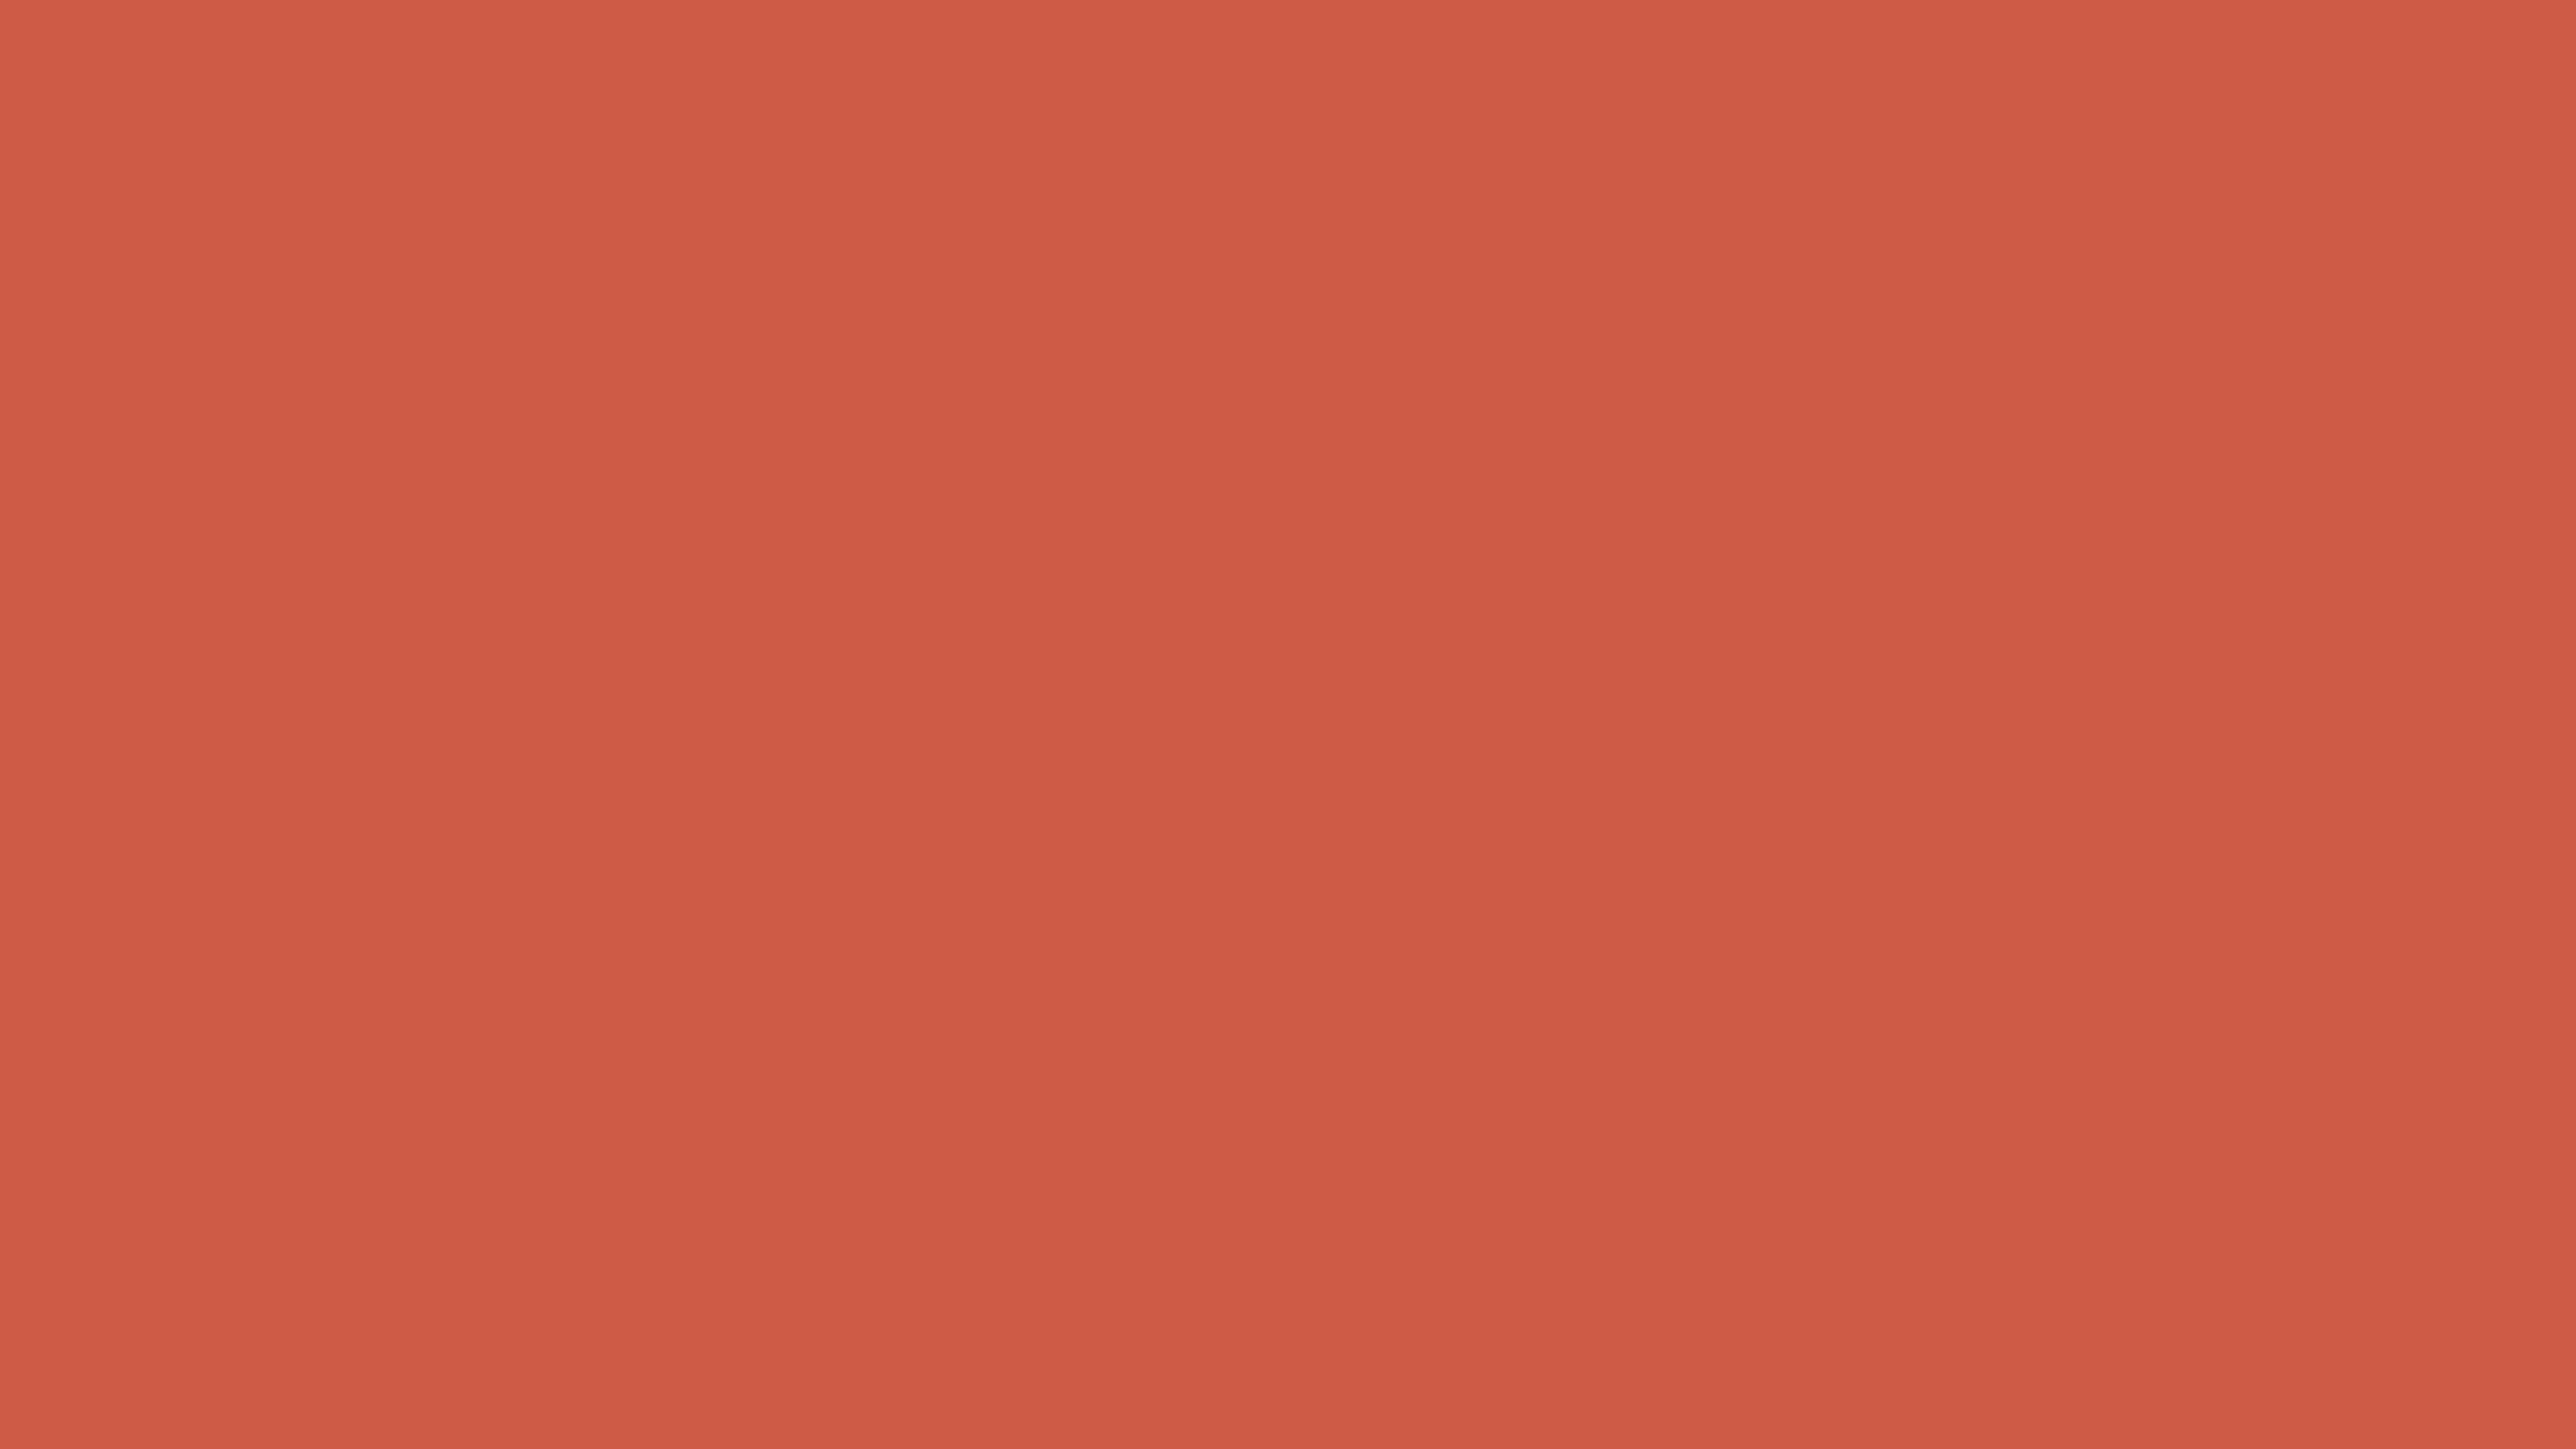 5120x2880 Dark Coral Solid Color Background